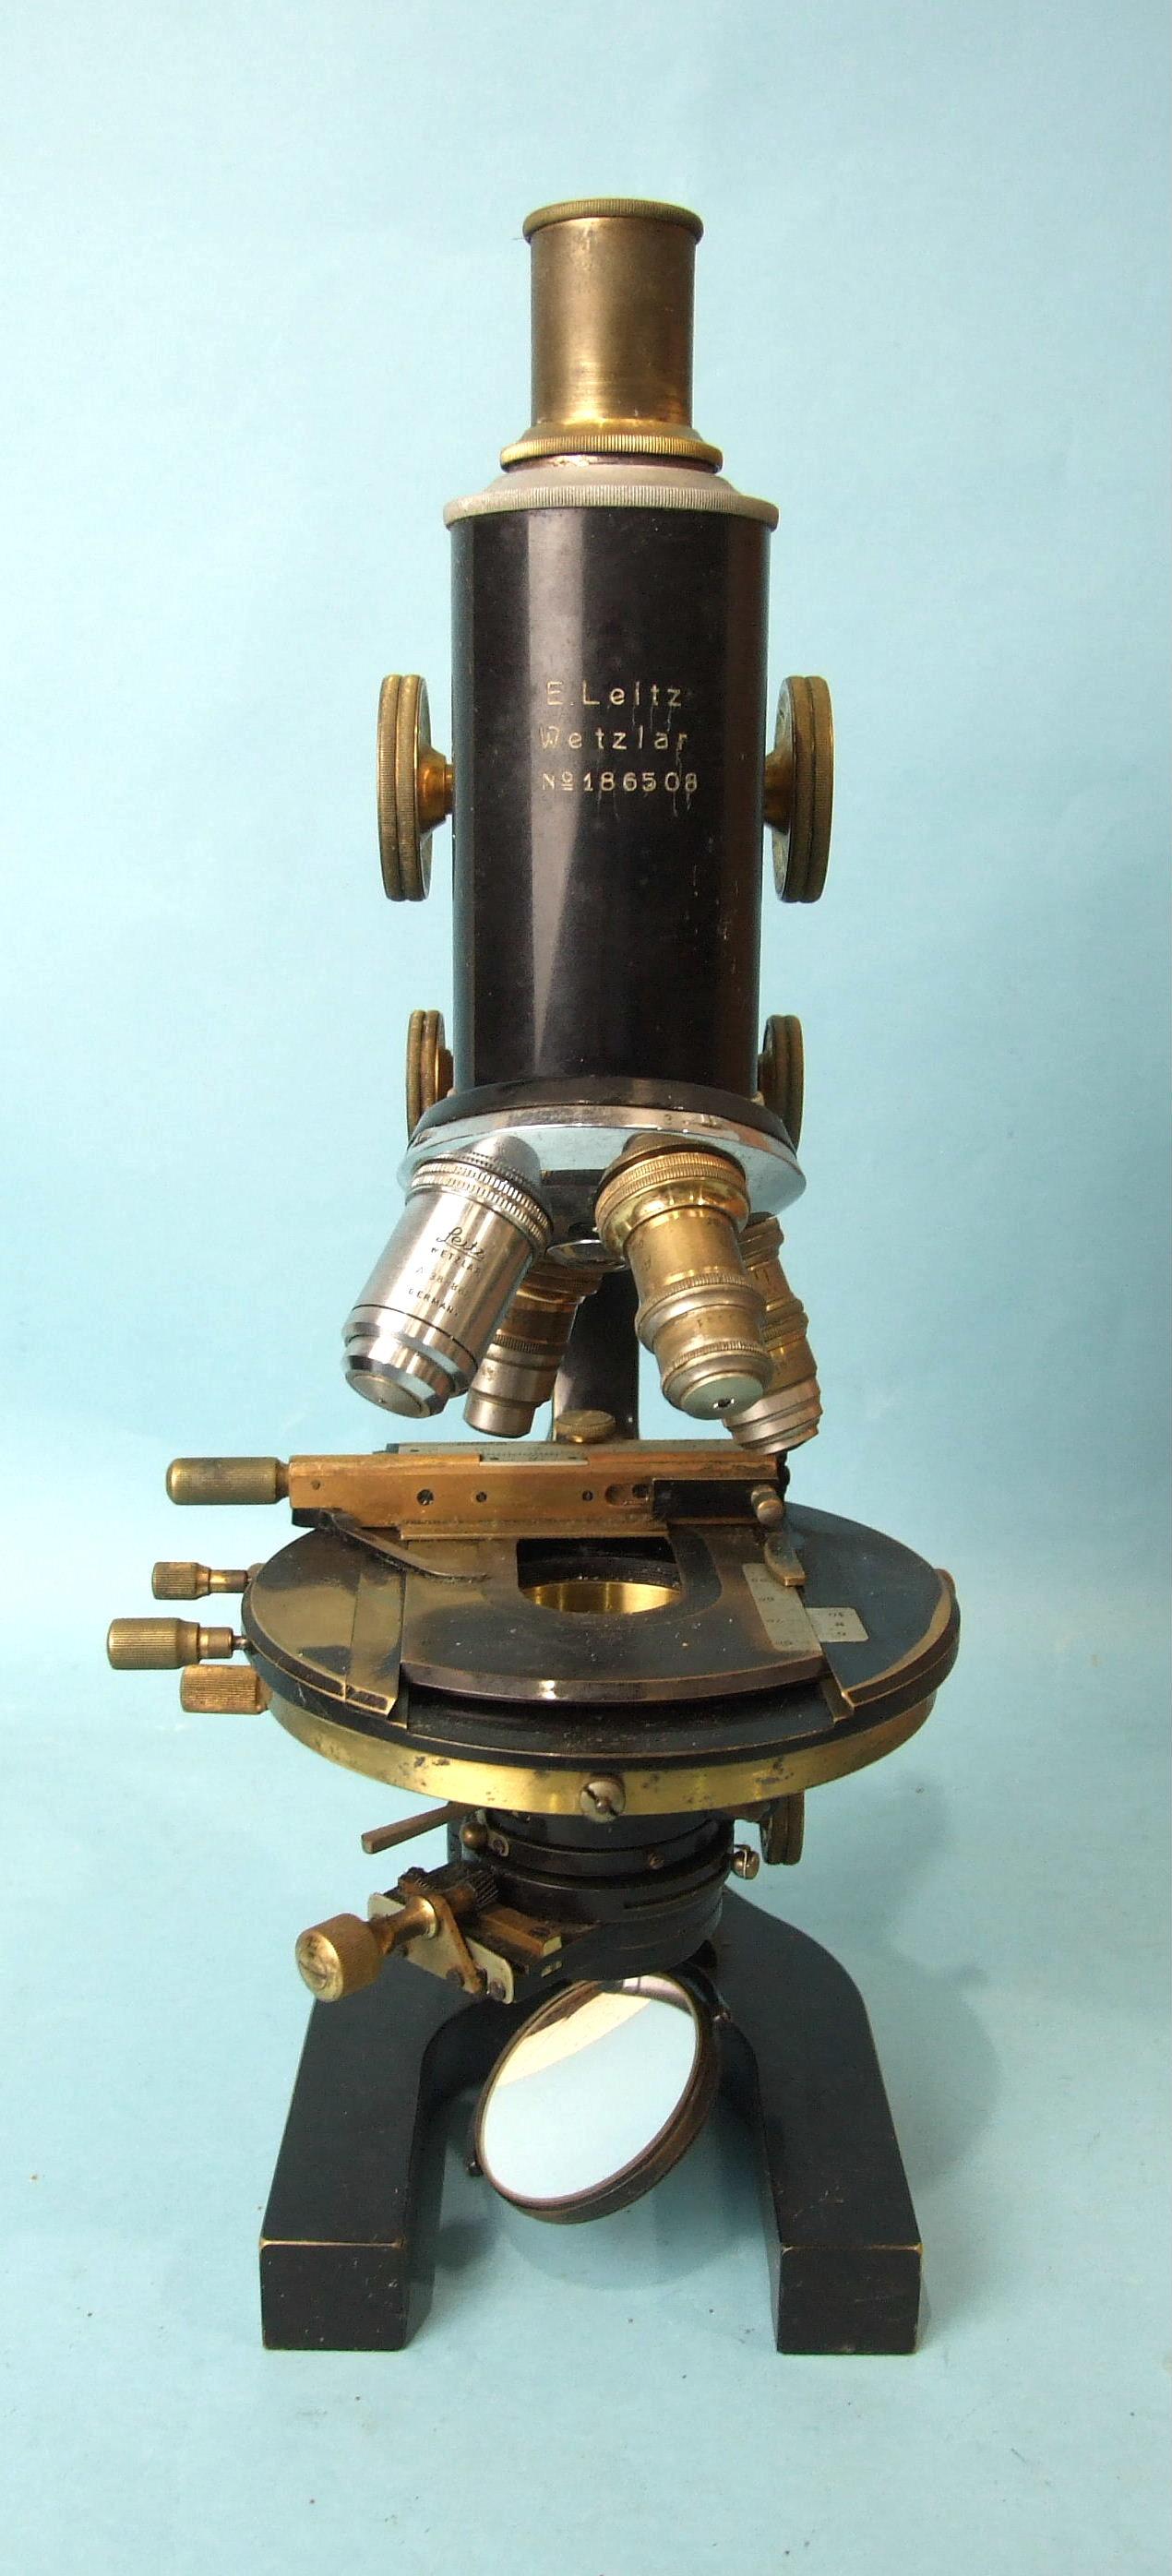 An E Leitz Wetzlar lacquered bronze monocular microscope no.186508, with accessories, in original